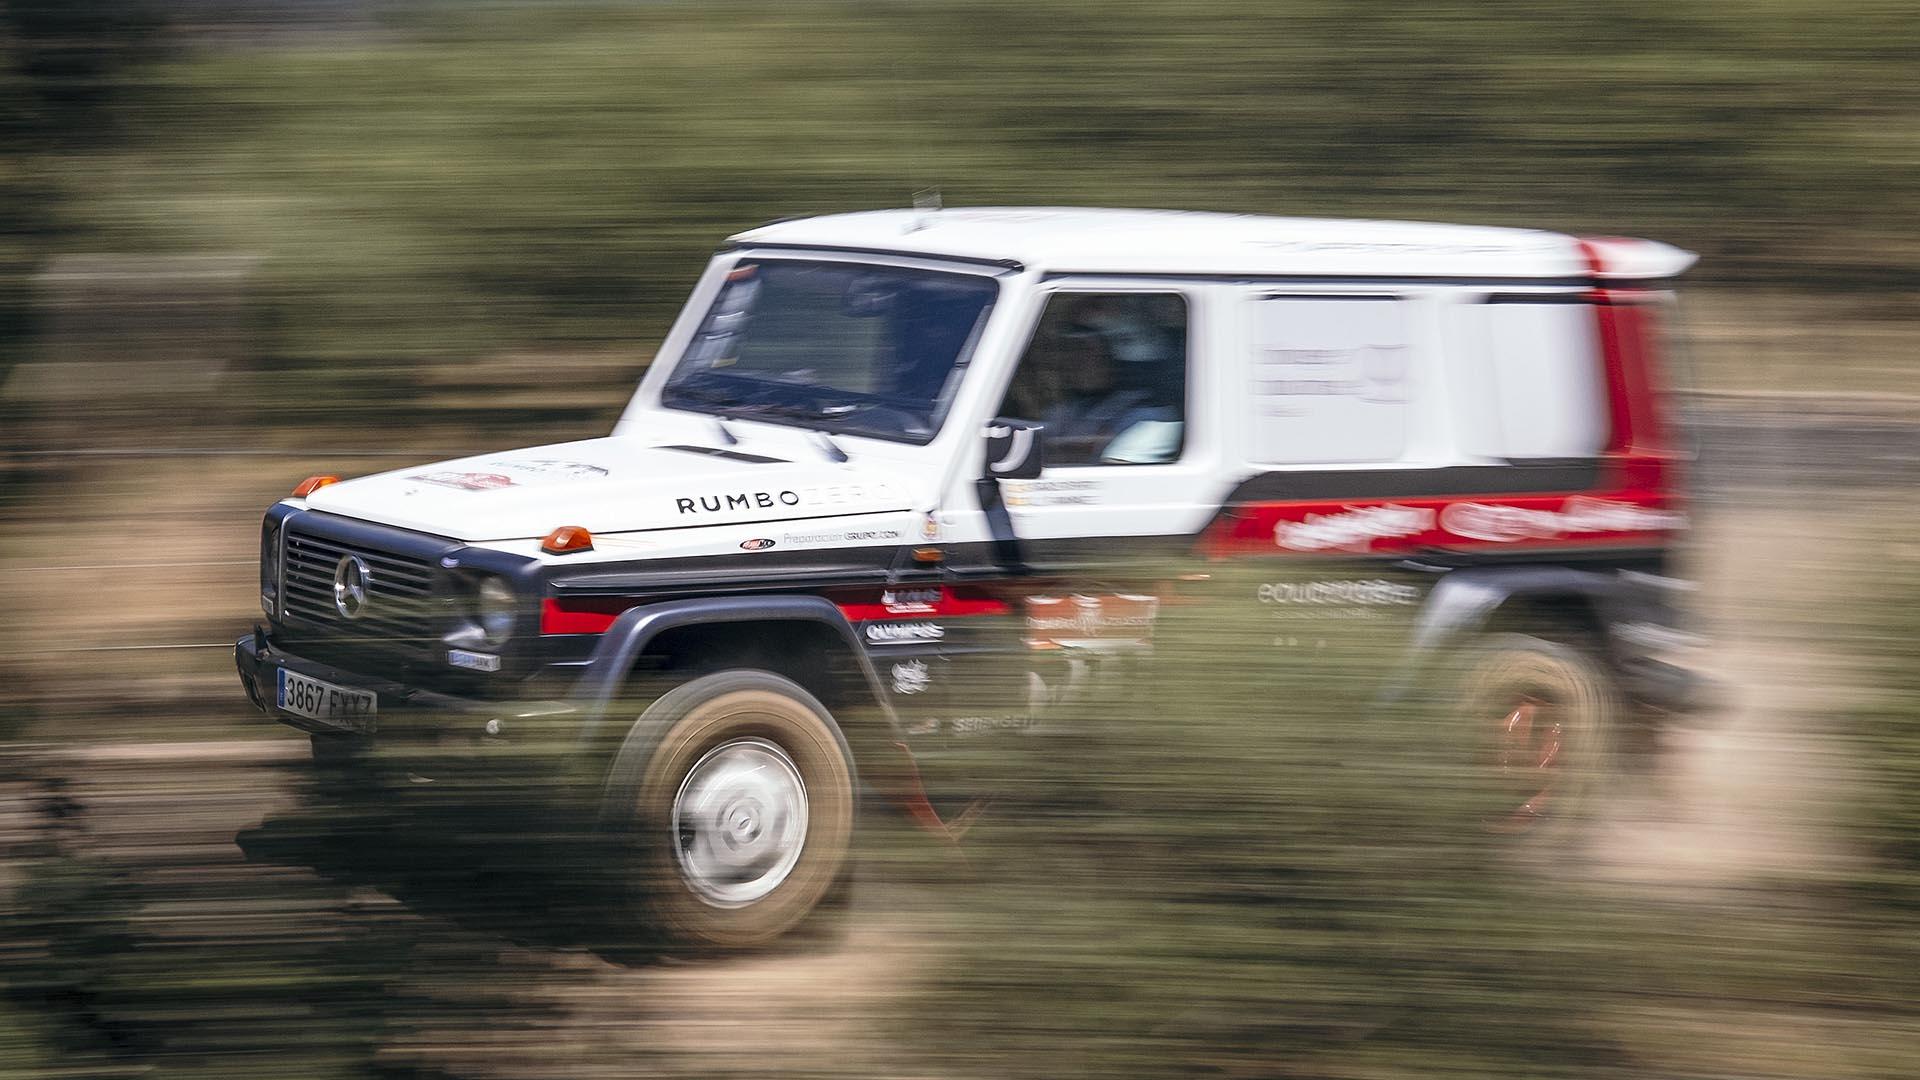 Prueba racing Mercedes G 320 RumboZero: un todoterreno purasangre para el Dakar Classic